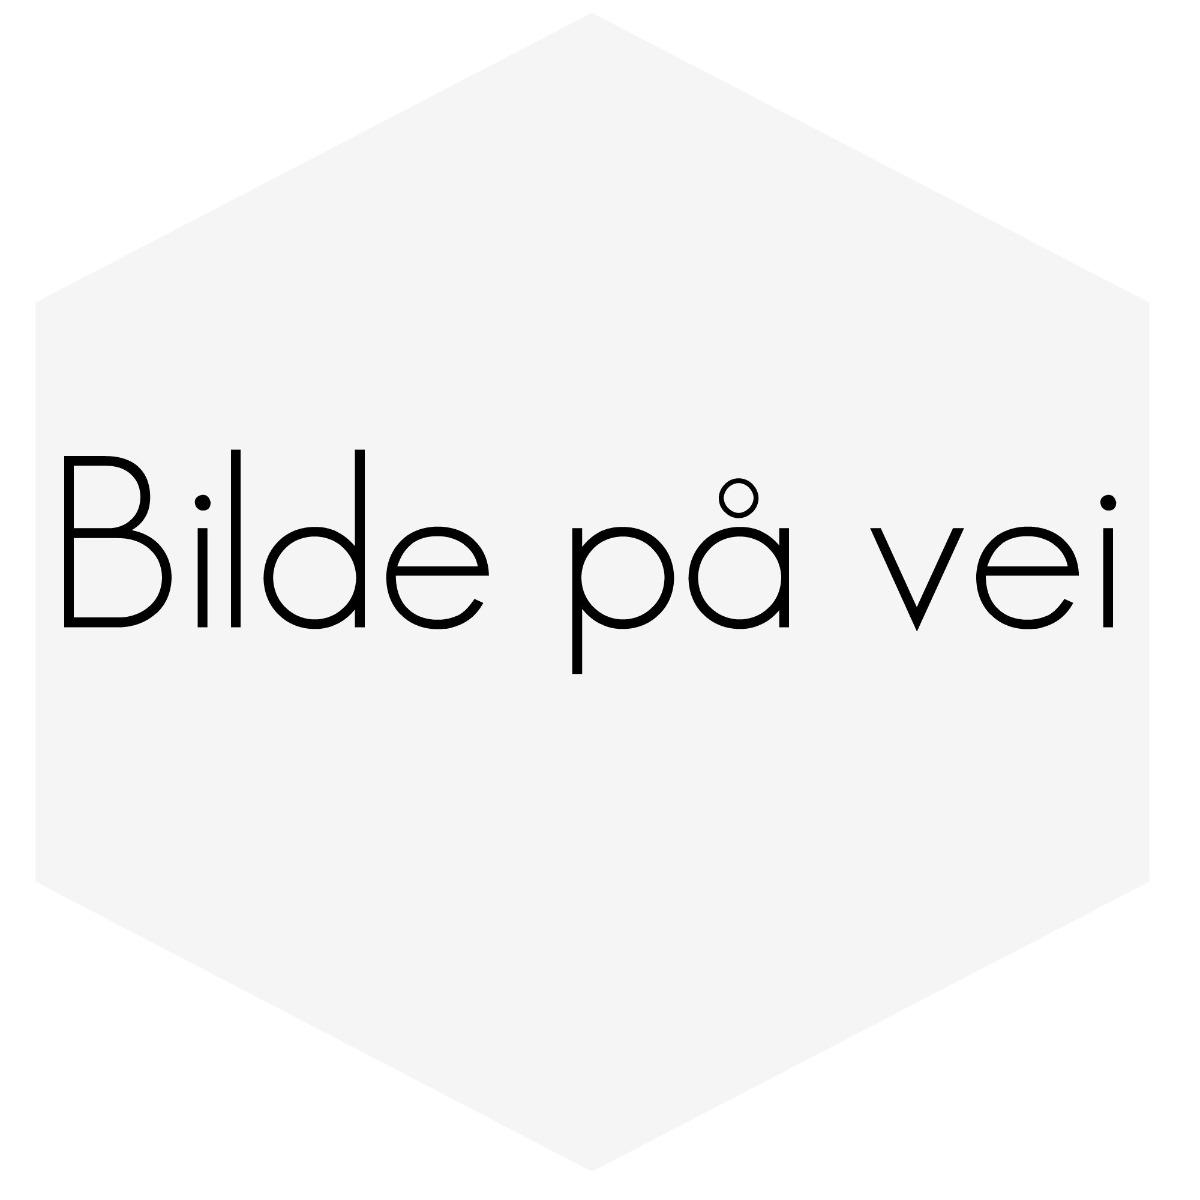 "SILIKONSLANGE RØD REDUSERING 2-2,375"" (51-60MM)"